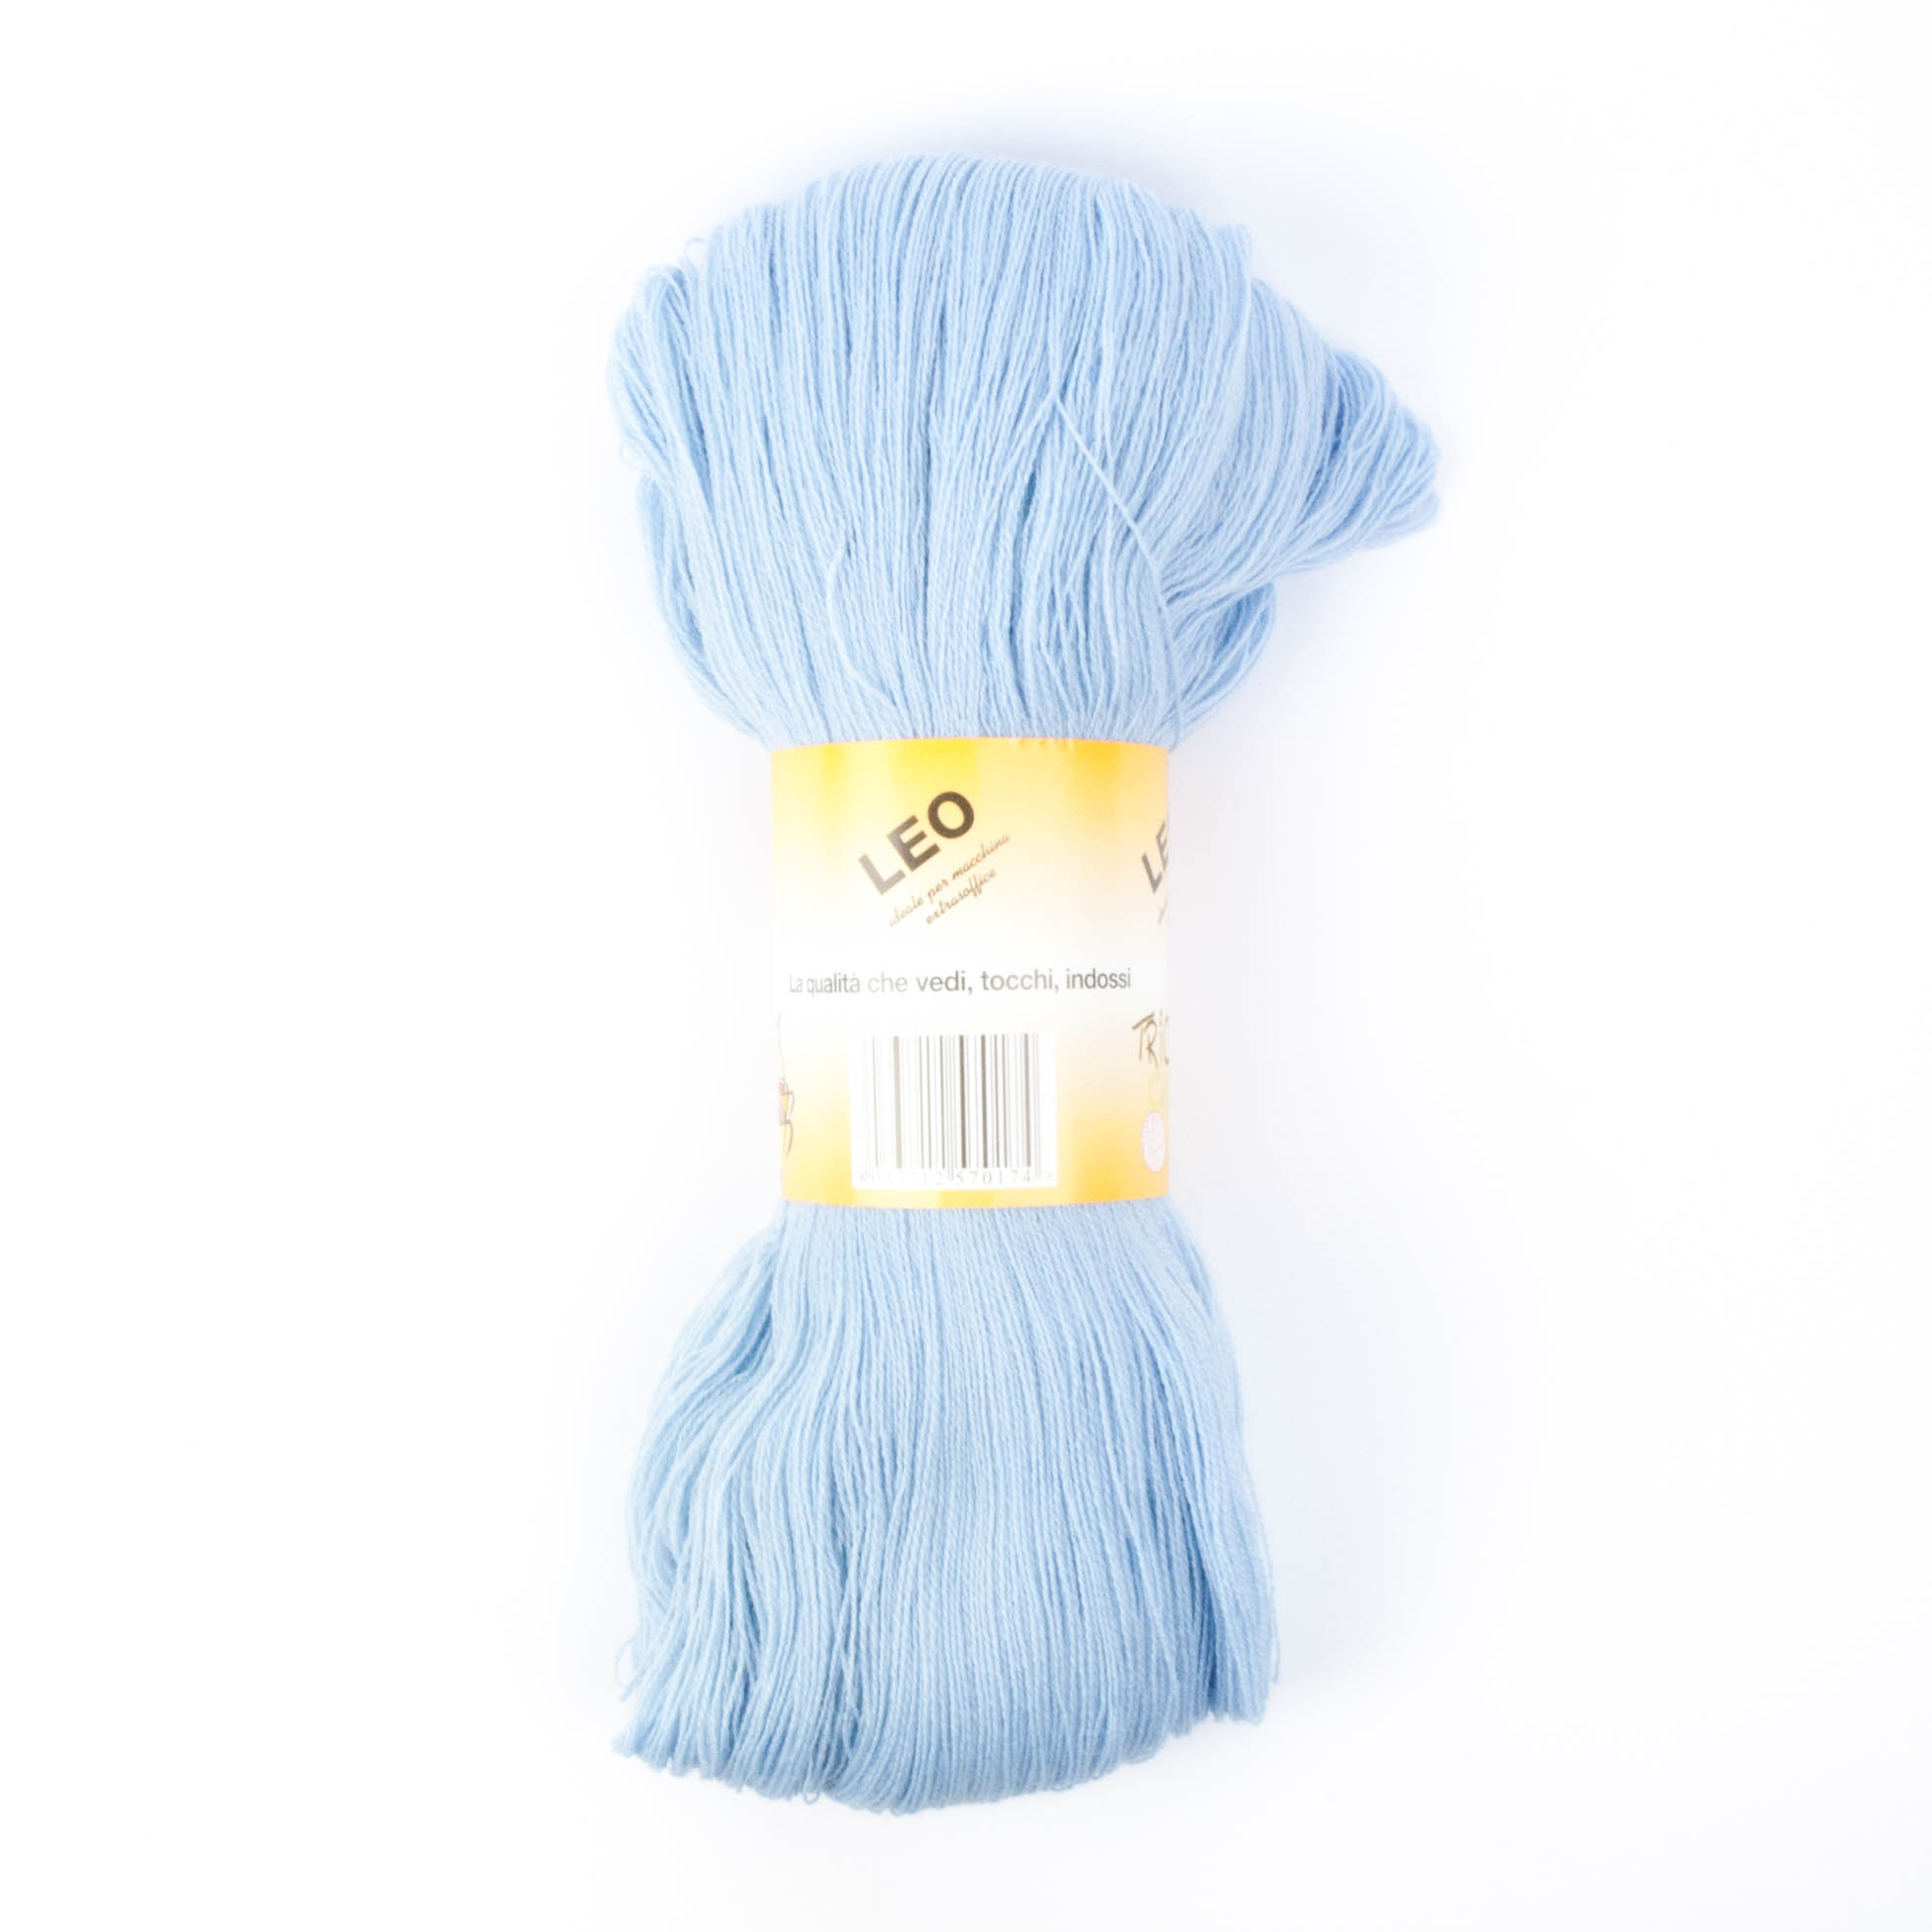 Leo - Matassa misto lana ideale per lavori a mano e macchina - Azzurro baby 20